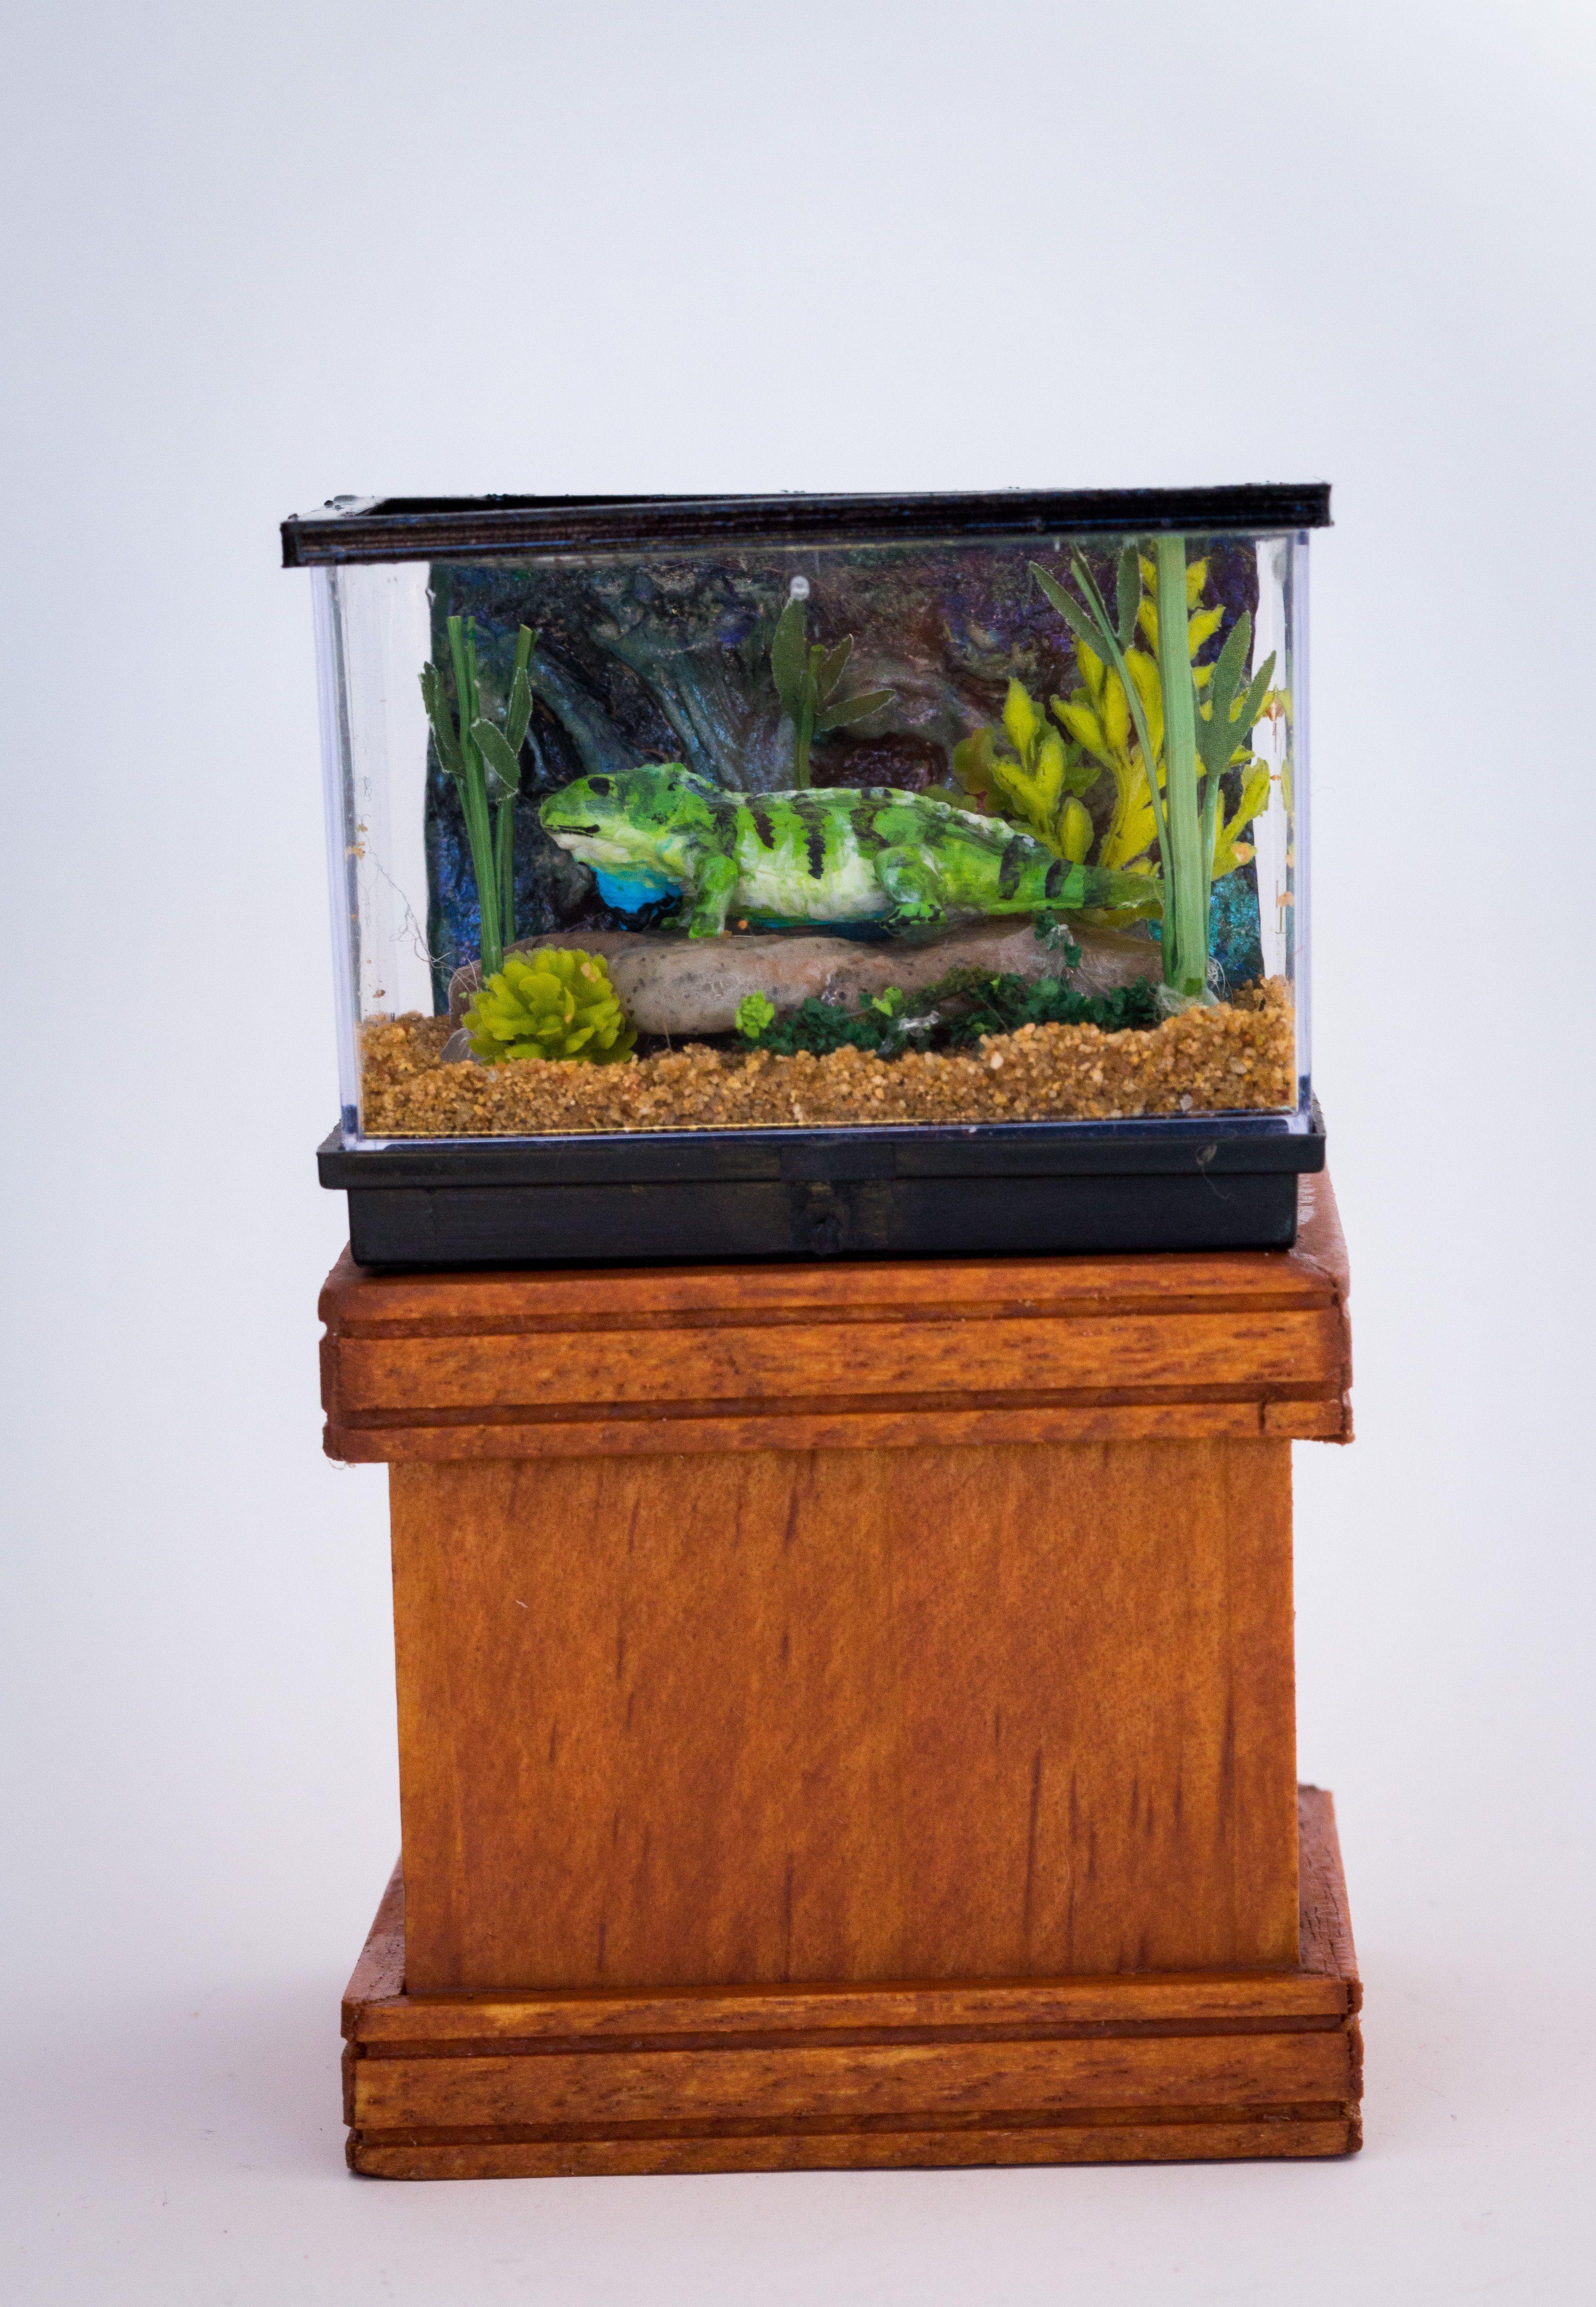 1 12 Scale Dollhouse Miniature Lizard Tank Animal Dollhouse